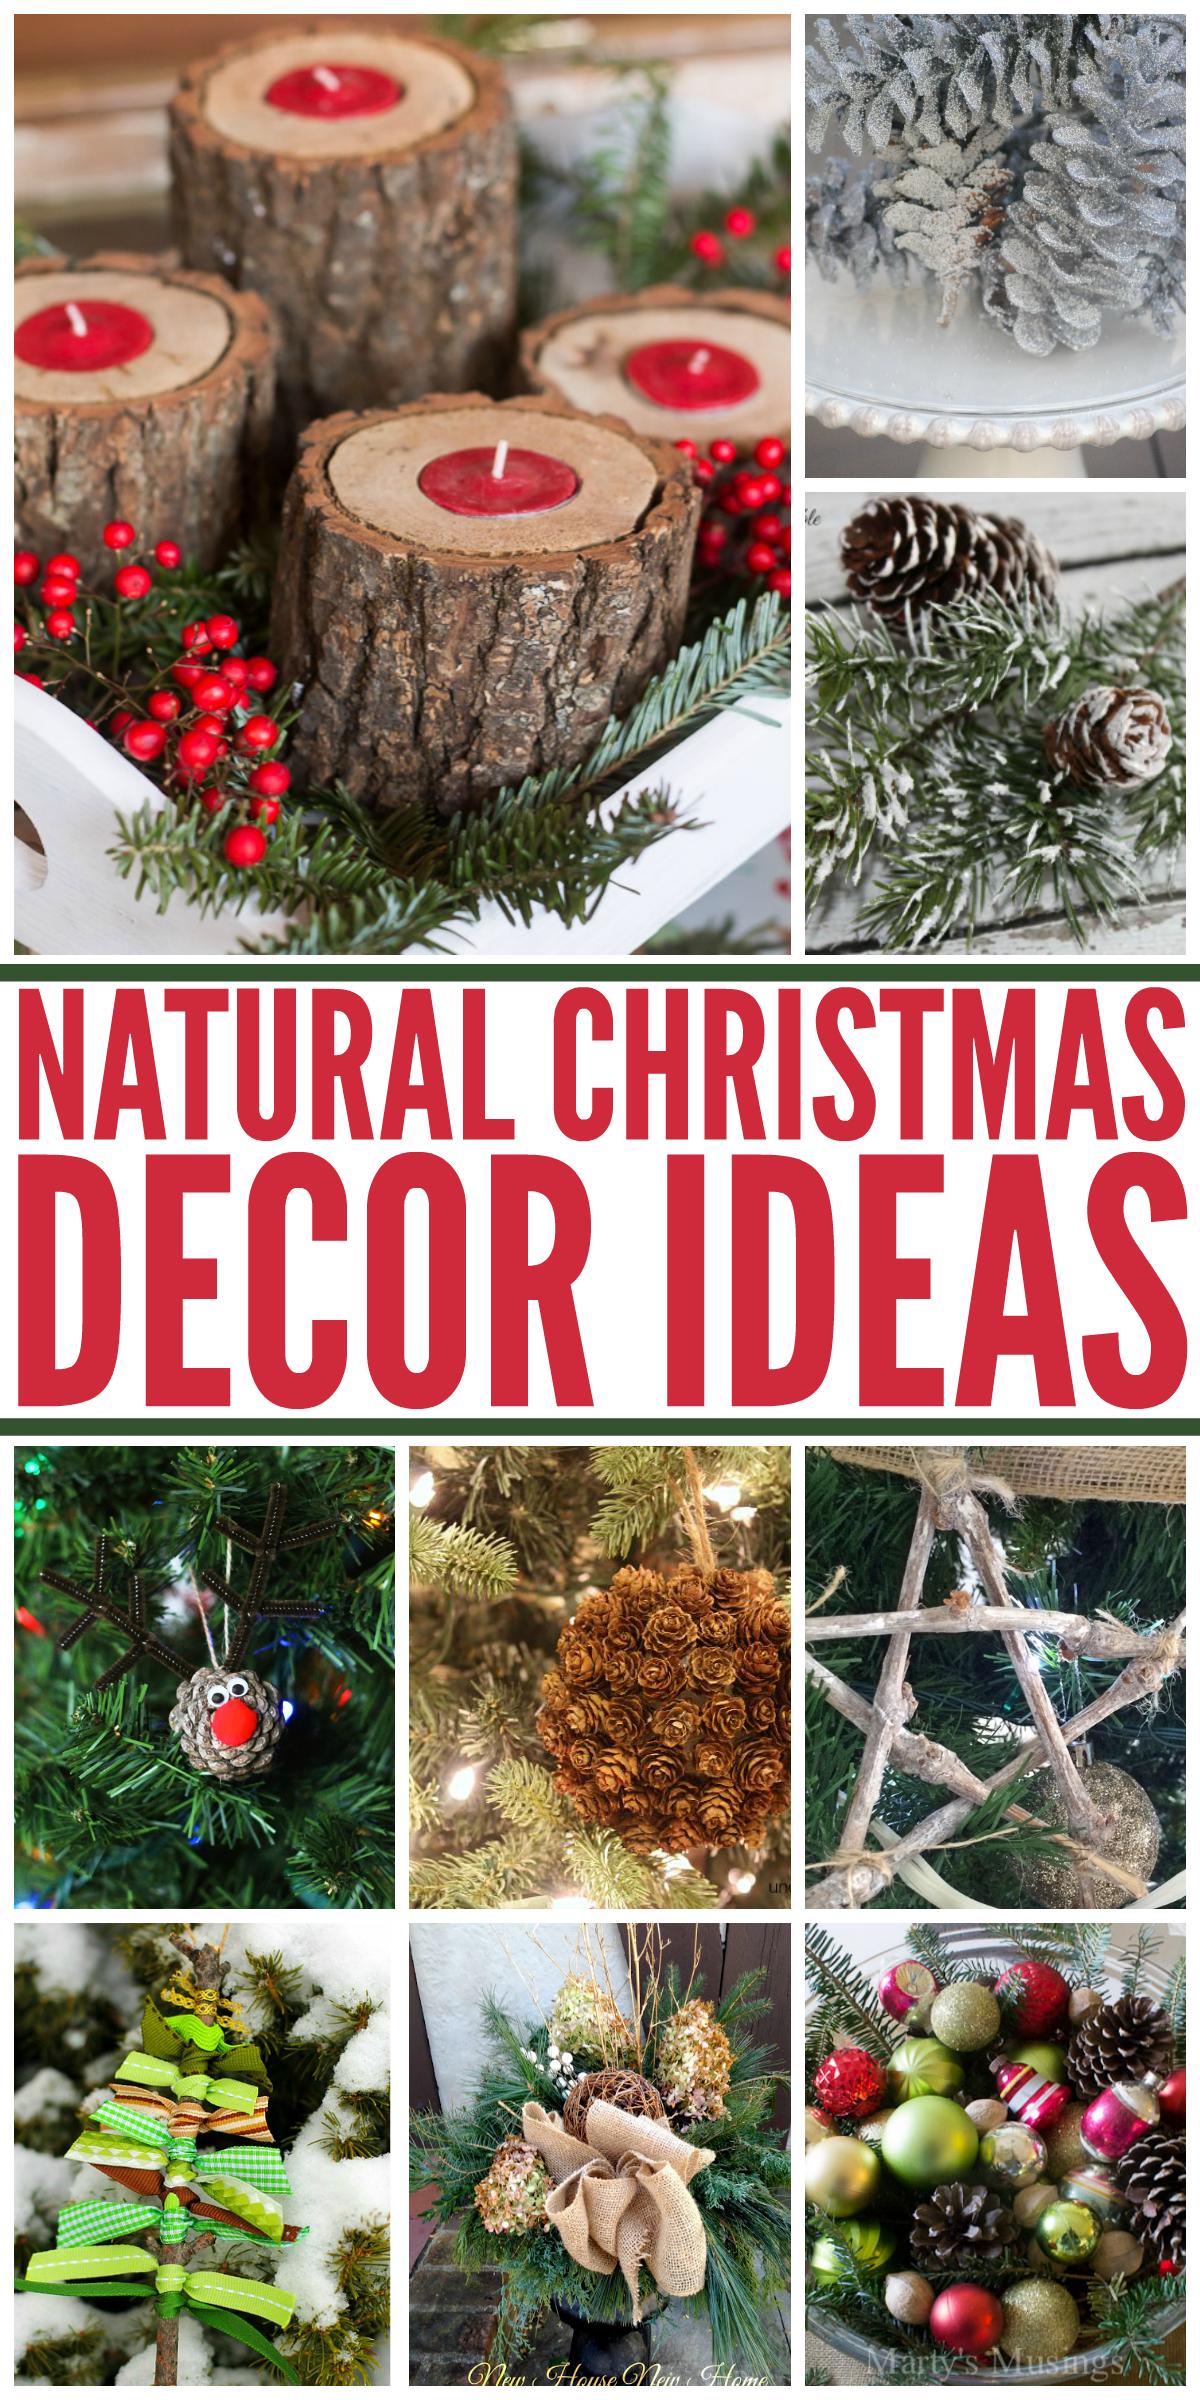 Natural Christmas Decor Ideas Aka Free Christmas Decorations Making Lemonade